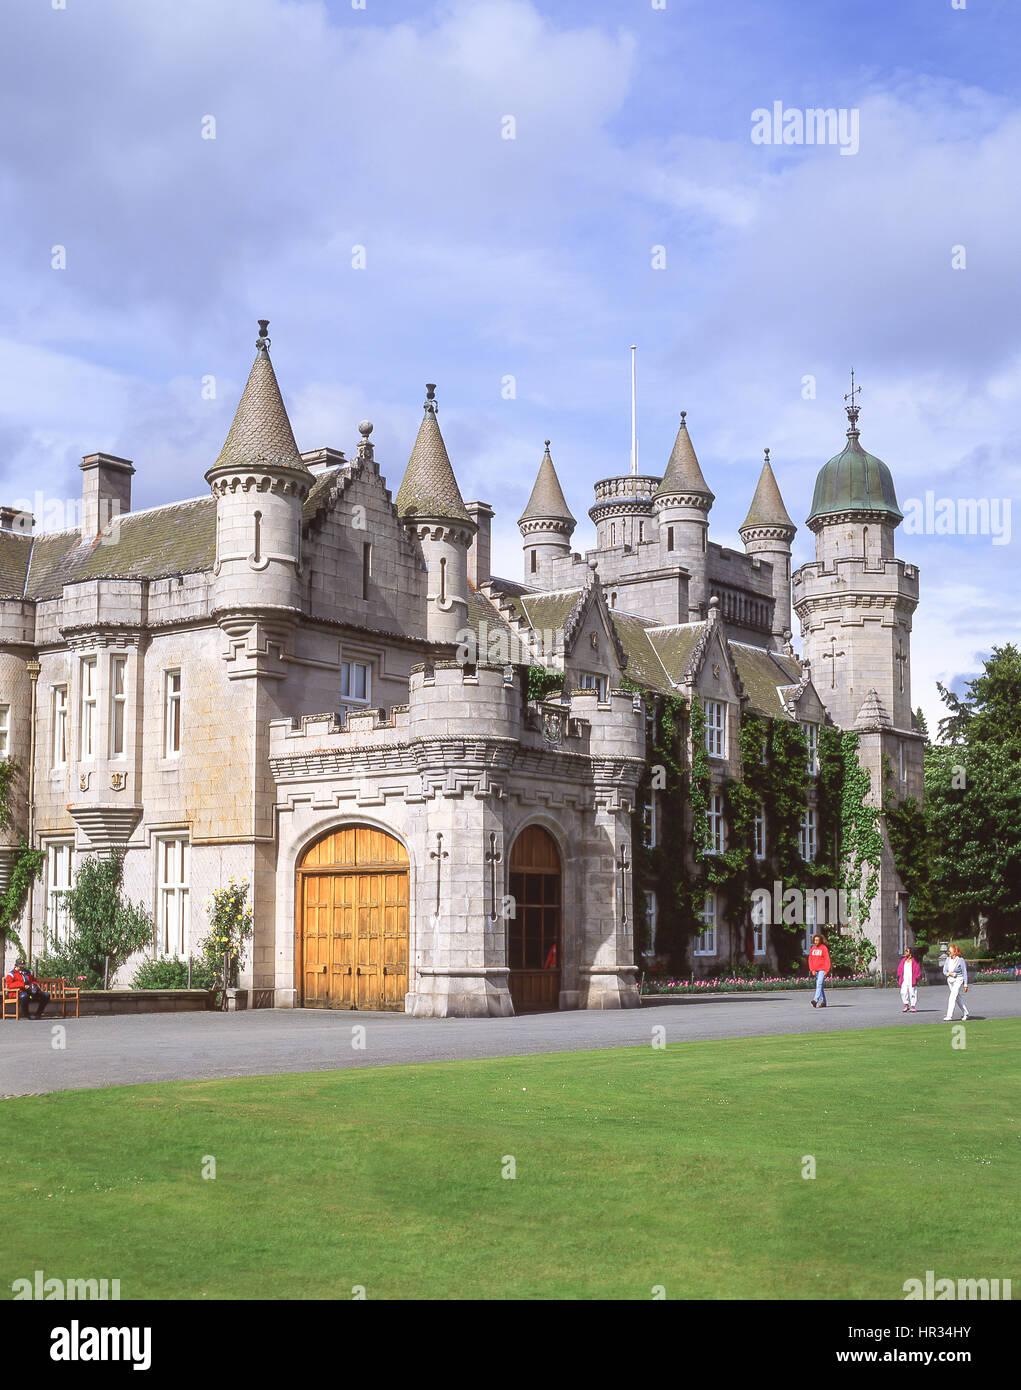 Balmoral Castle and gardens, Royal Deeside, Aberdeenshire, Scotland, United Kingdom - Stock Image